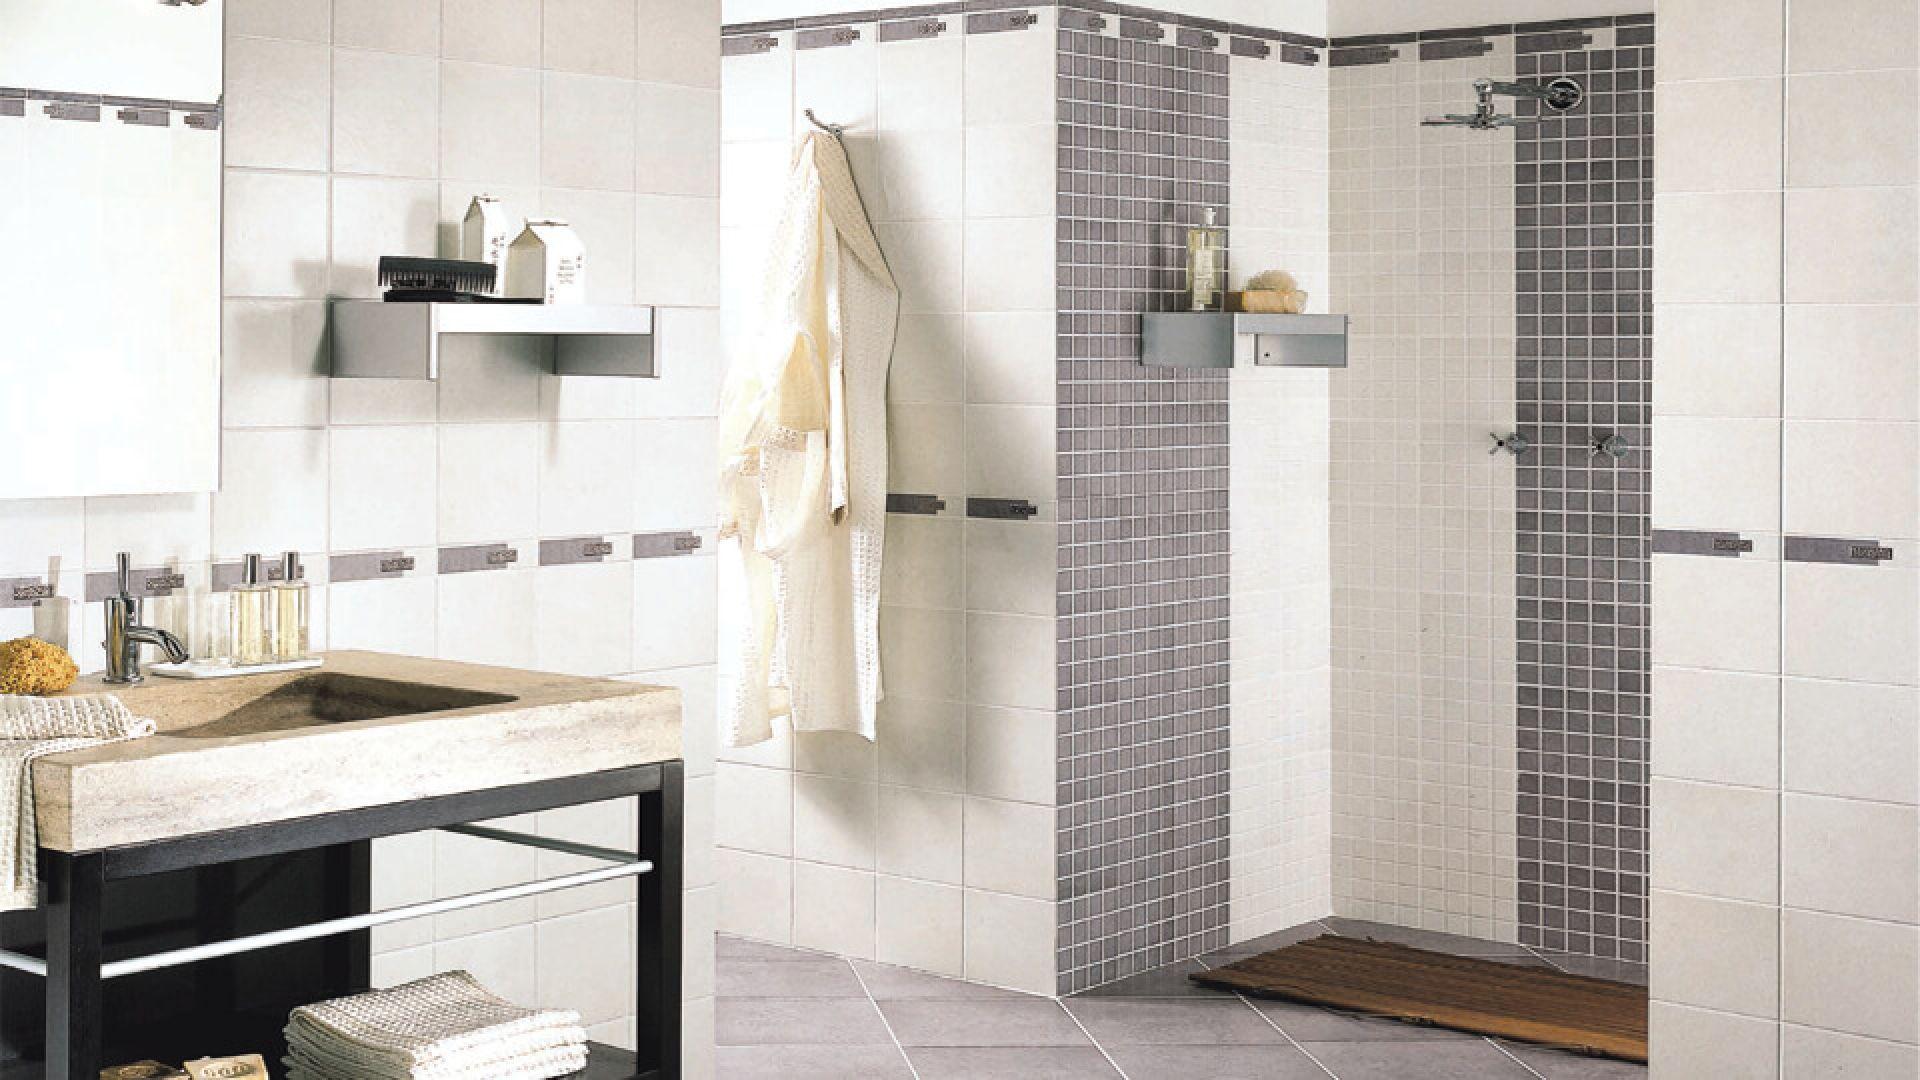 pose faience salle de bain horizontale ou verticale excellent faience salle de bain vert idaces. Black Bedroom Furniture Sets. Home Design Ideas